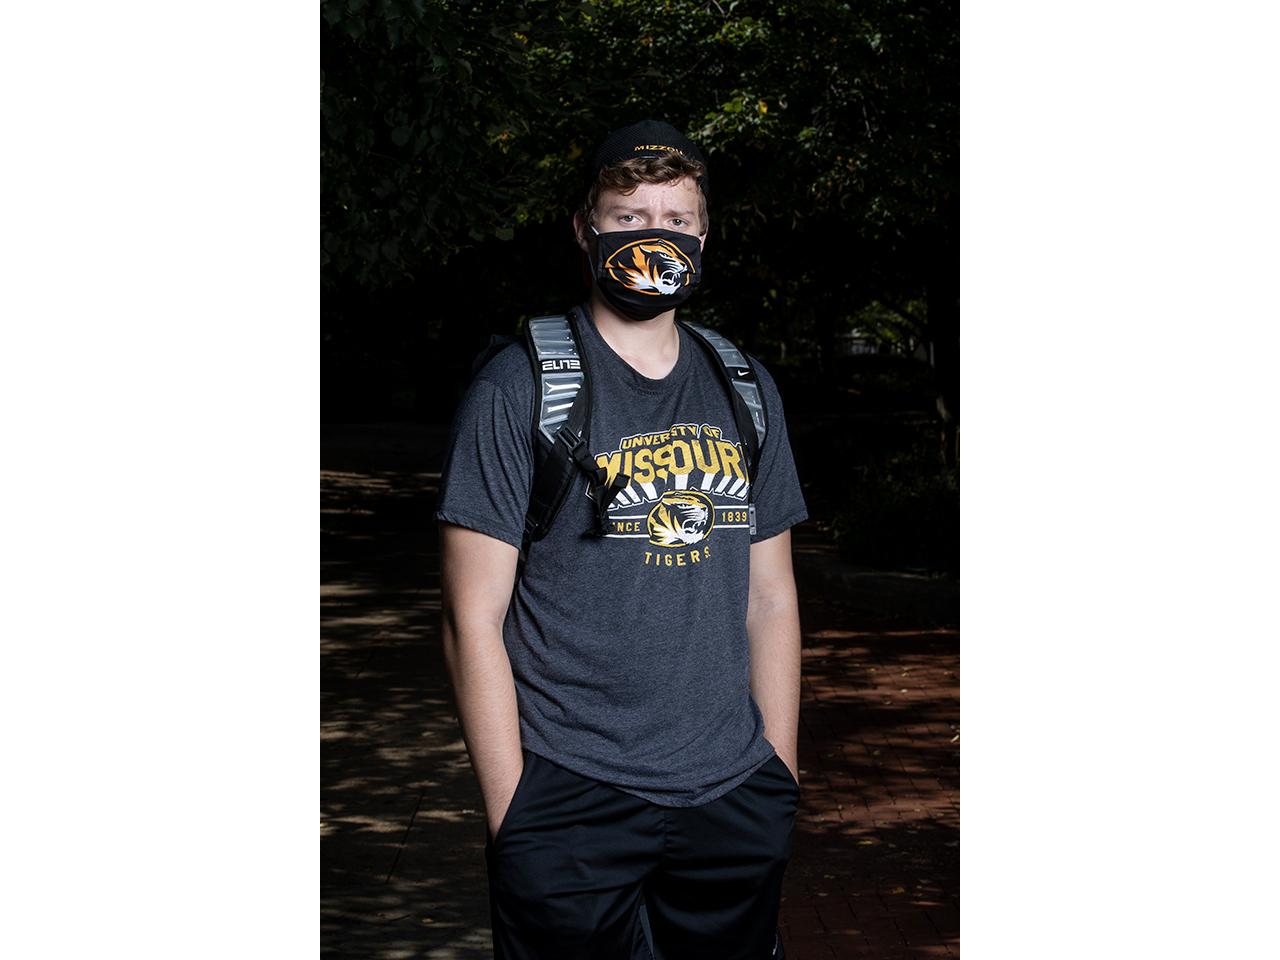 Garrett Baylie, freshman majoring in business